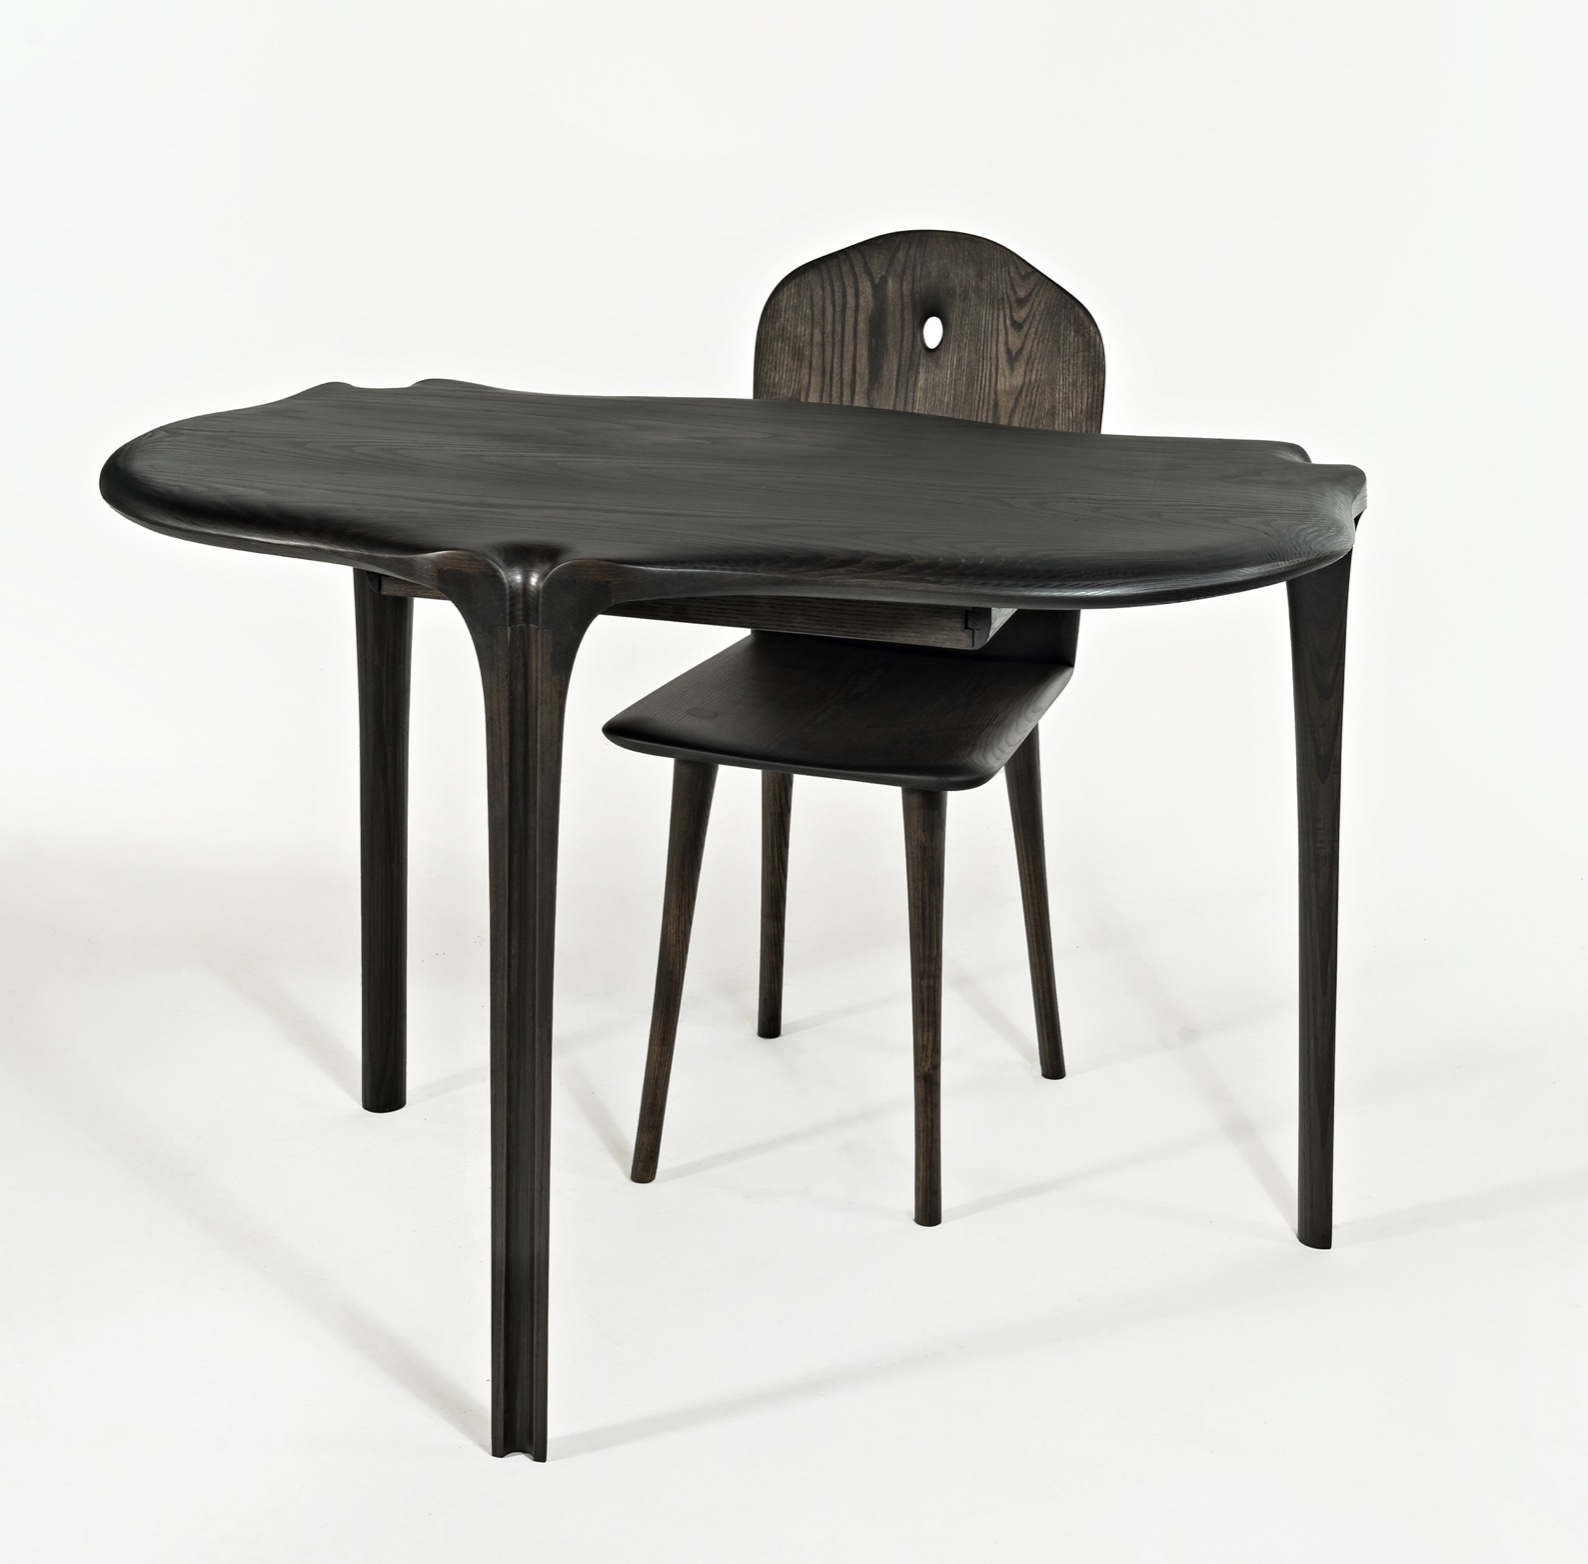 Writing Desk and Conrad Chair by artist Christopher Kurtz